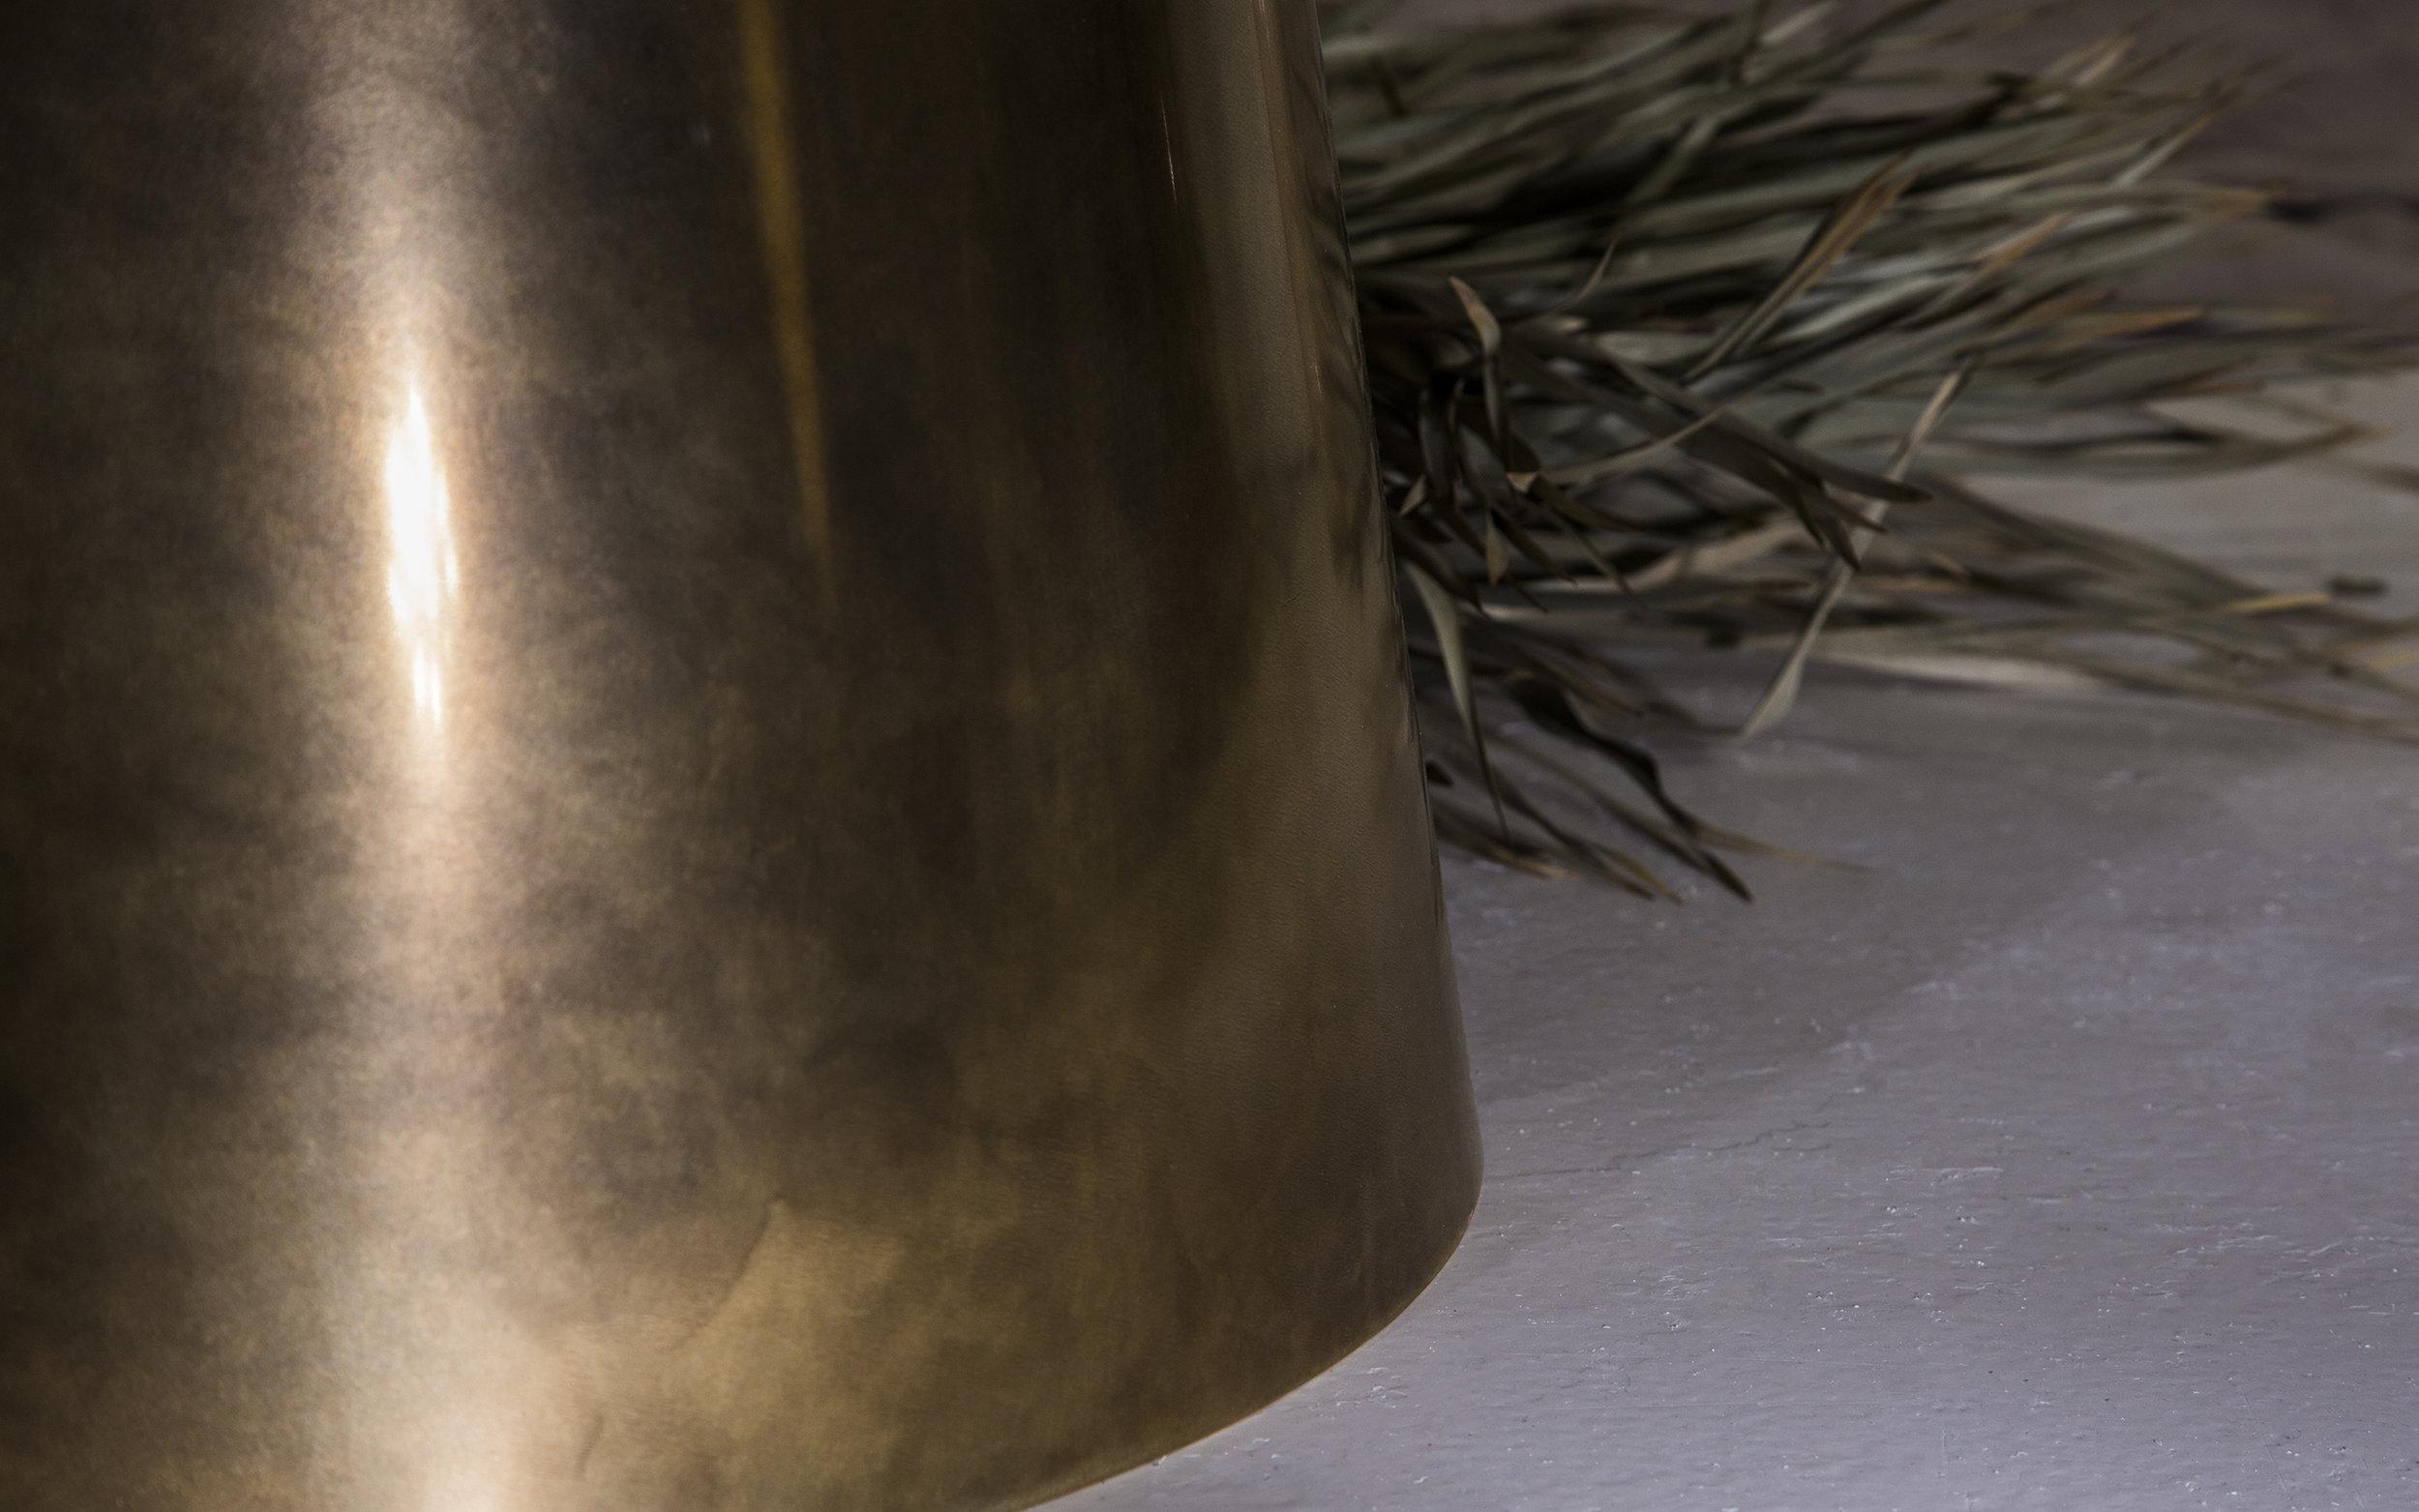 NOVOCASTRIAN_Stanhope Brass 4_WEB.jpg